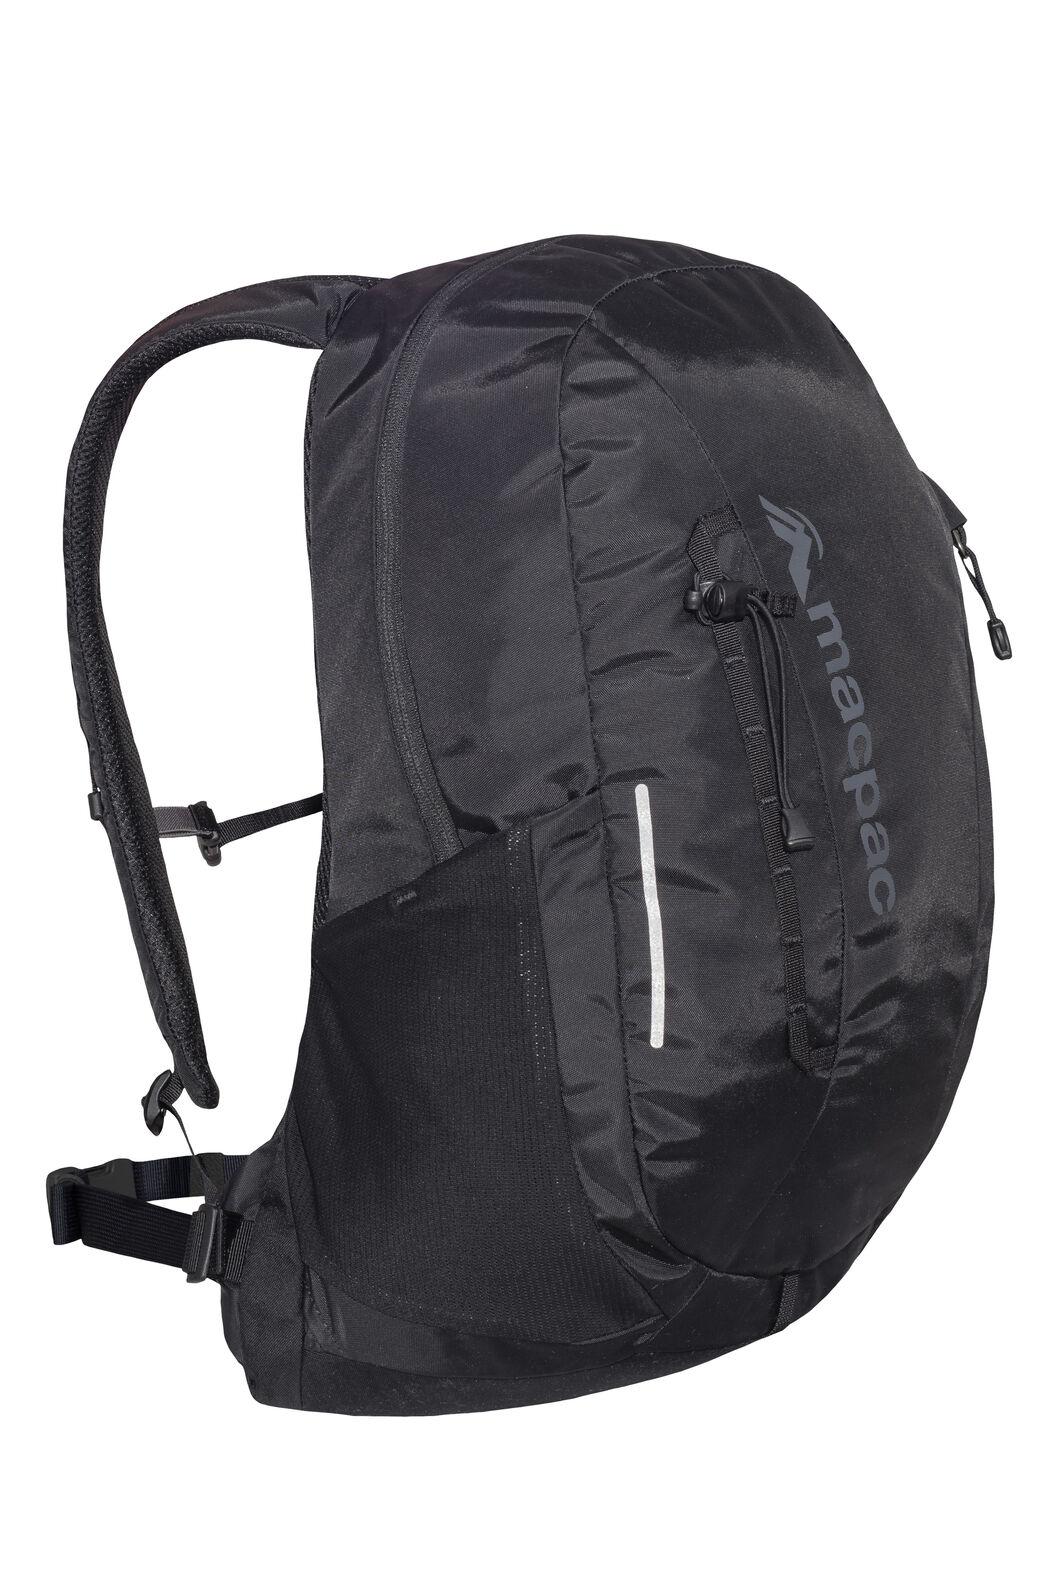 Rapaki 22L Backpack, Black, hi-res